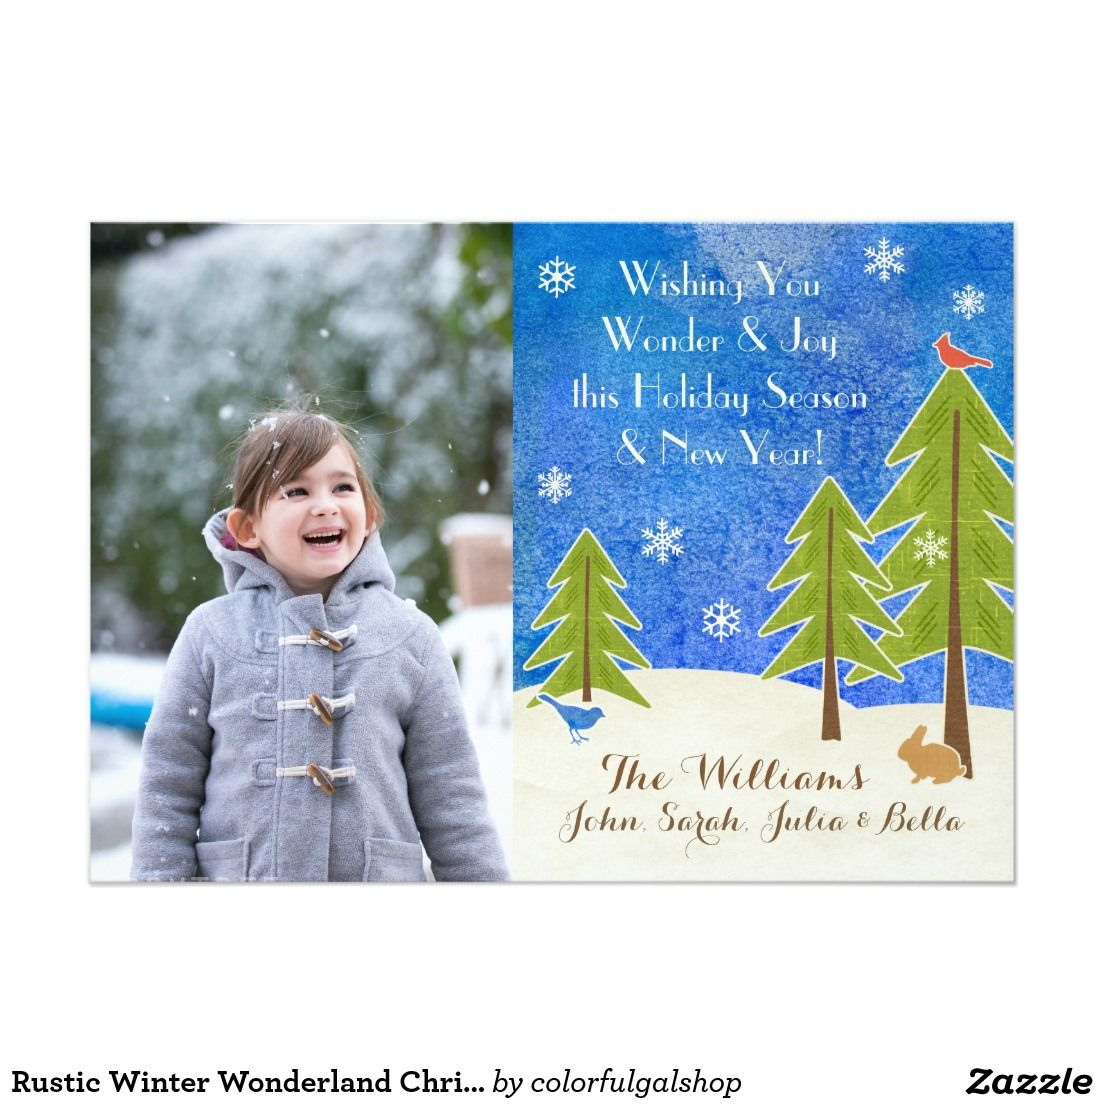 Rustic Winter Wonderland Christmas Wonder And Joy Holiday Photo Card